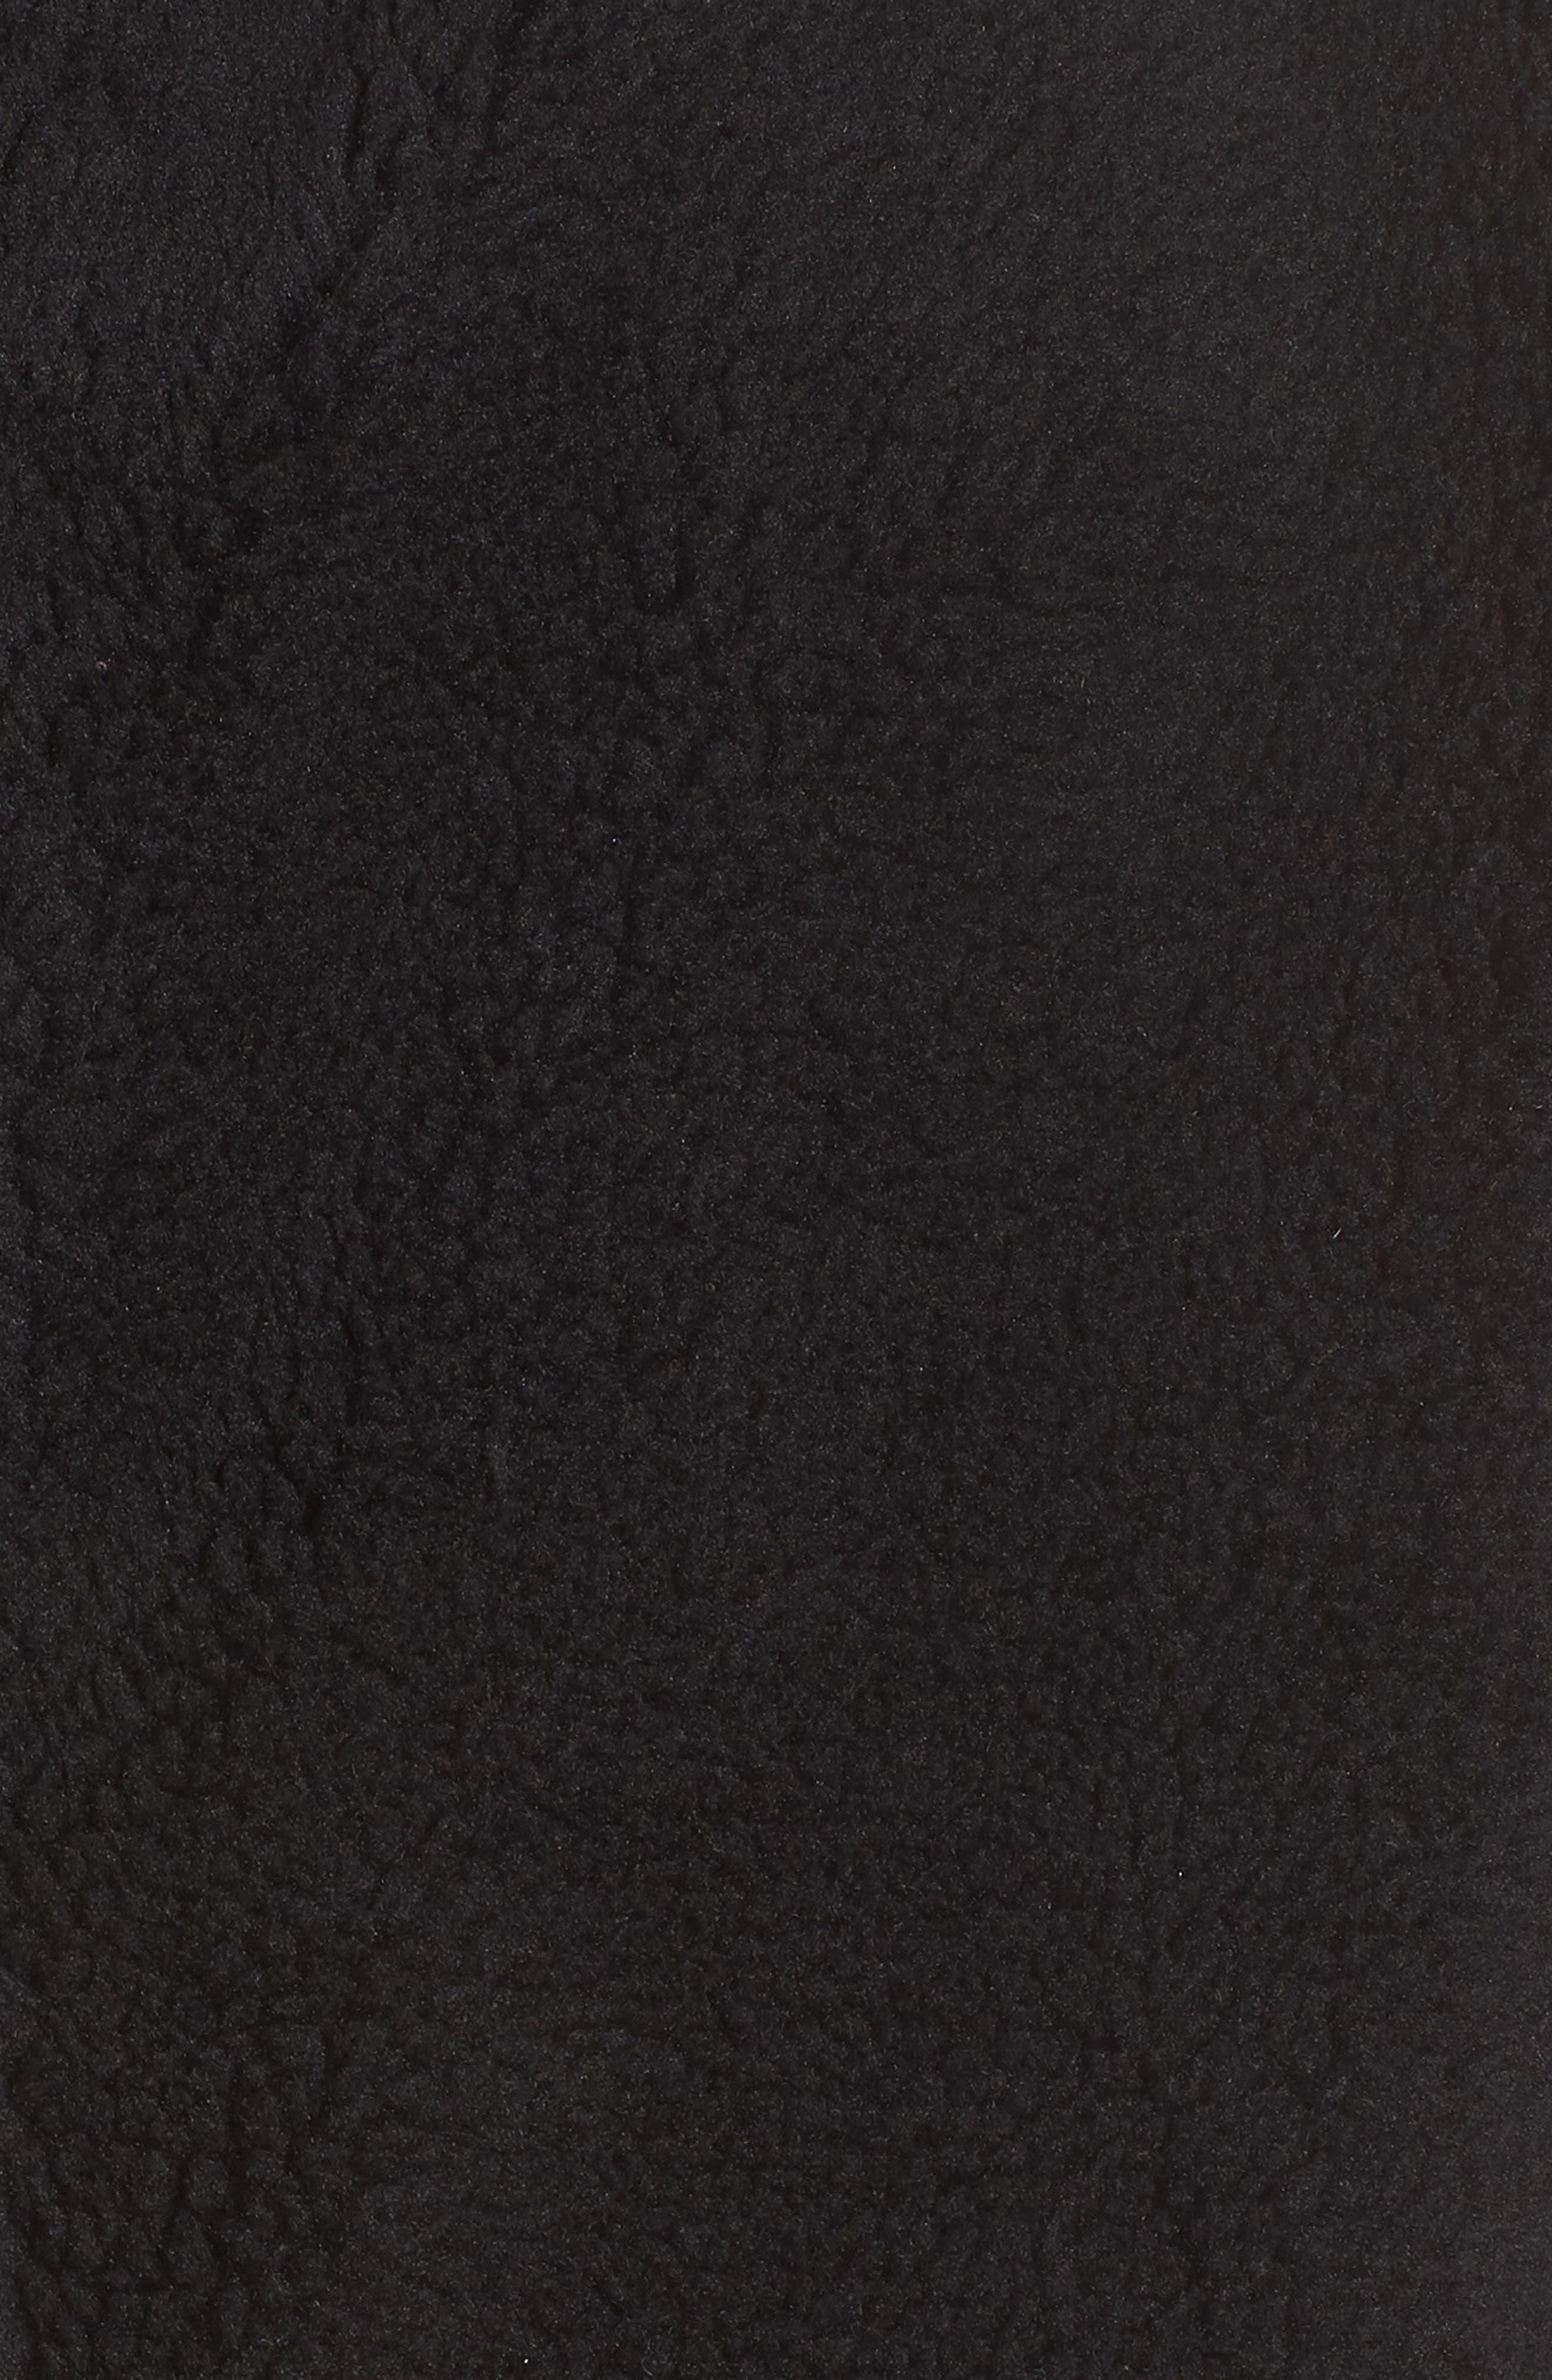 Foxy Faux Fur Jacket,                             Alternate thumbnail 6, color,                             BLACK